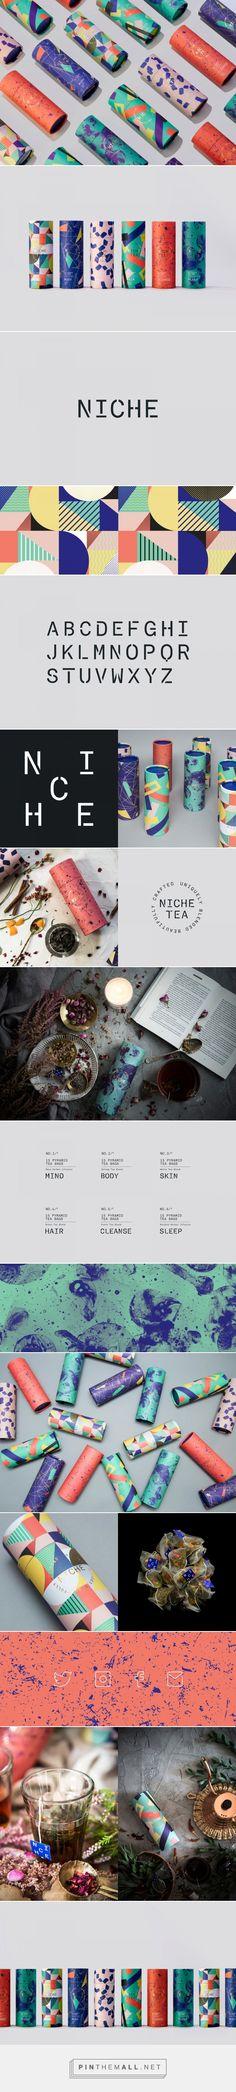 Food infographic Niche Tea packaging design by IWANT design - www. Infographic Description Niche Tea packaging design by IWANT design - Cool Packaging, Tea Packaging, Brand Packaging, Packaging Design Inspiration, Graphic Design Inspiration, Pattern Vegetal, Tea Design, Coffee Design, Stationary Design